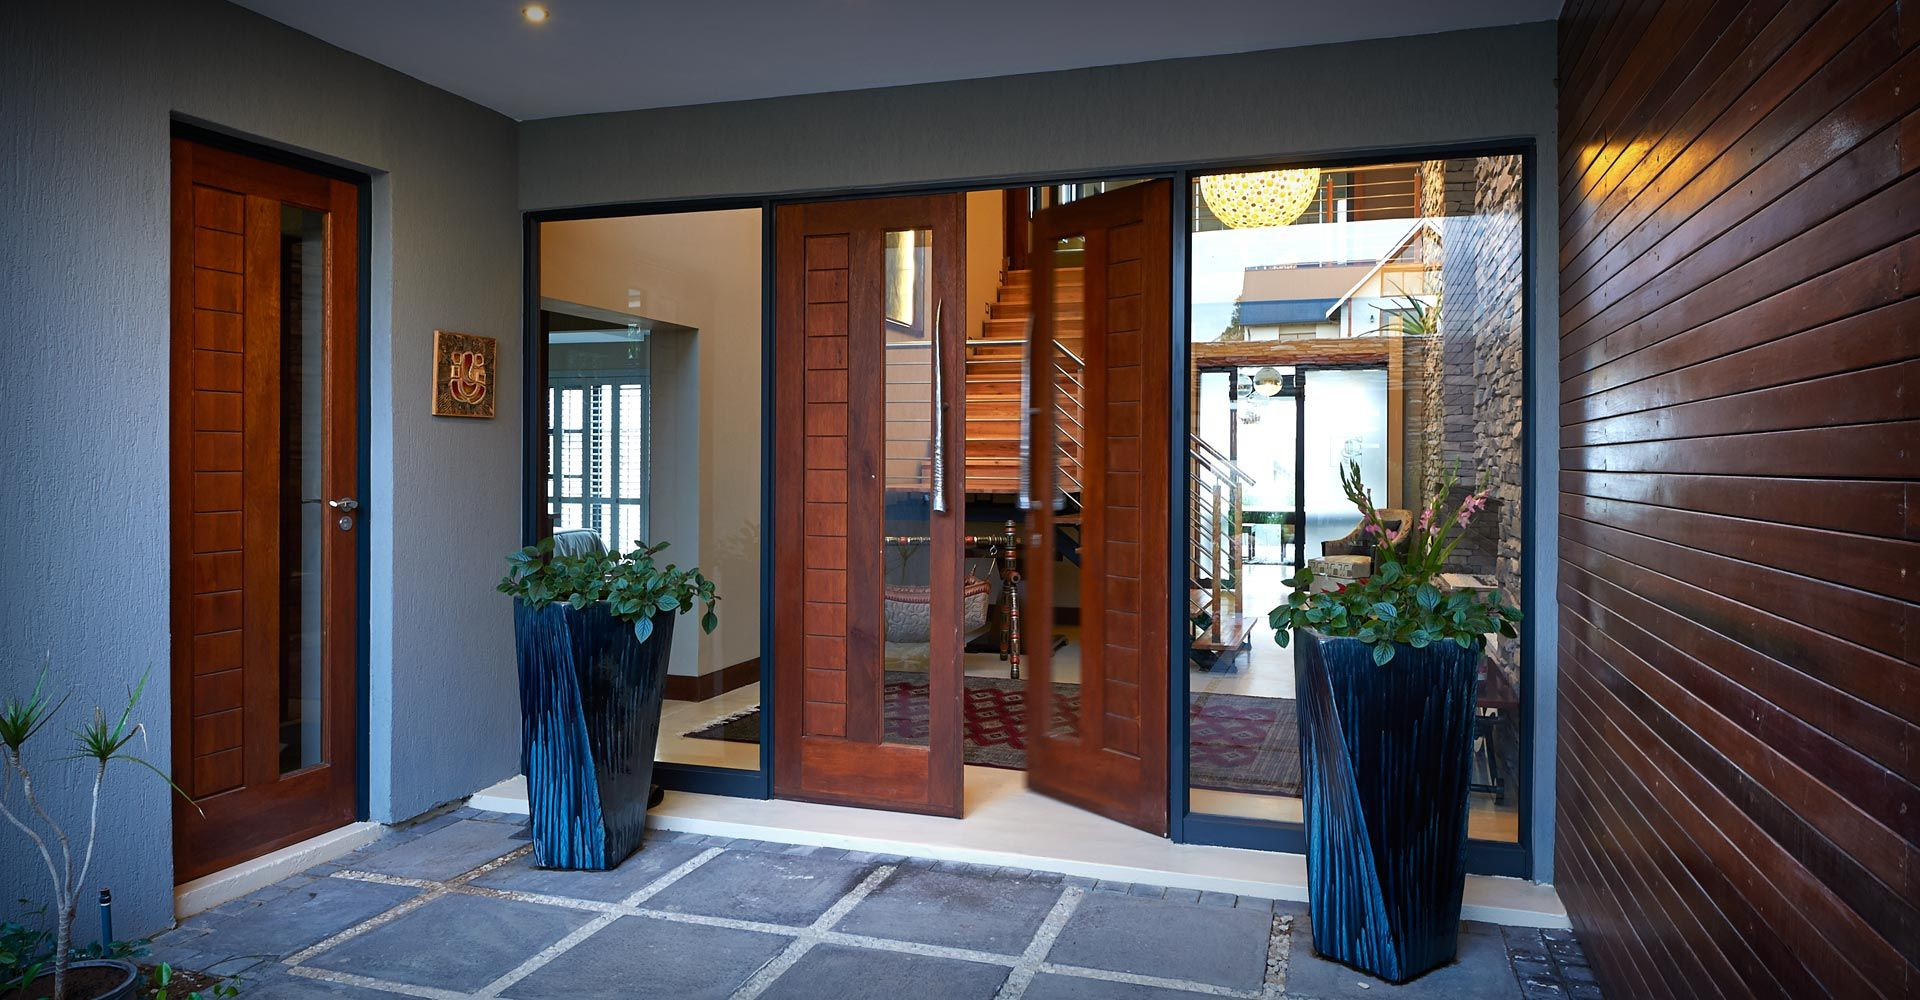 Van acht windows doors van acht windows doors portals wooden doors aluminium doors wooden windows aluminium windows since thousands of home owners and builders use us on a regular basis rubansaba